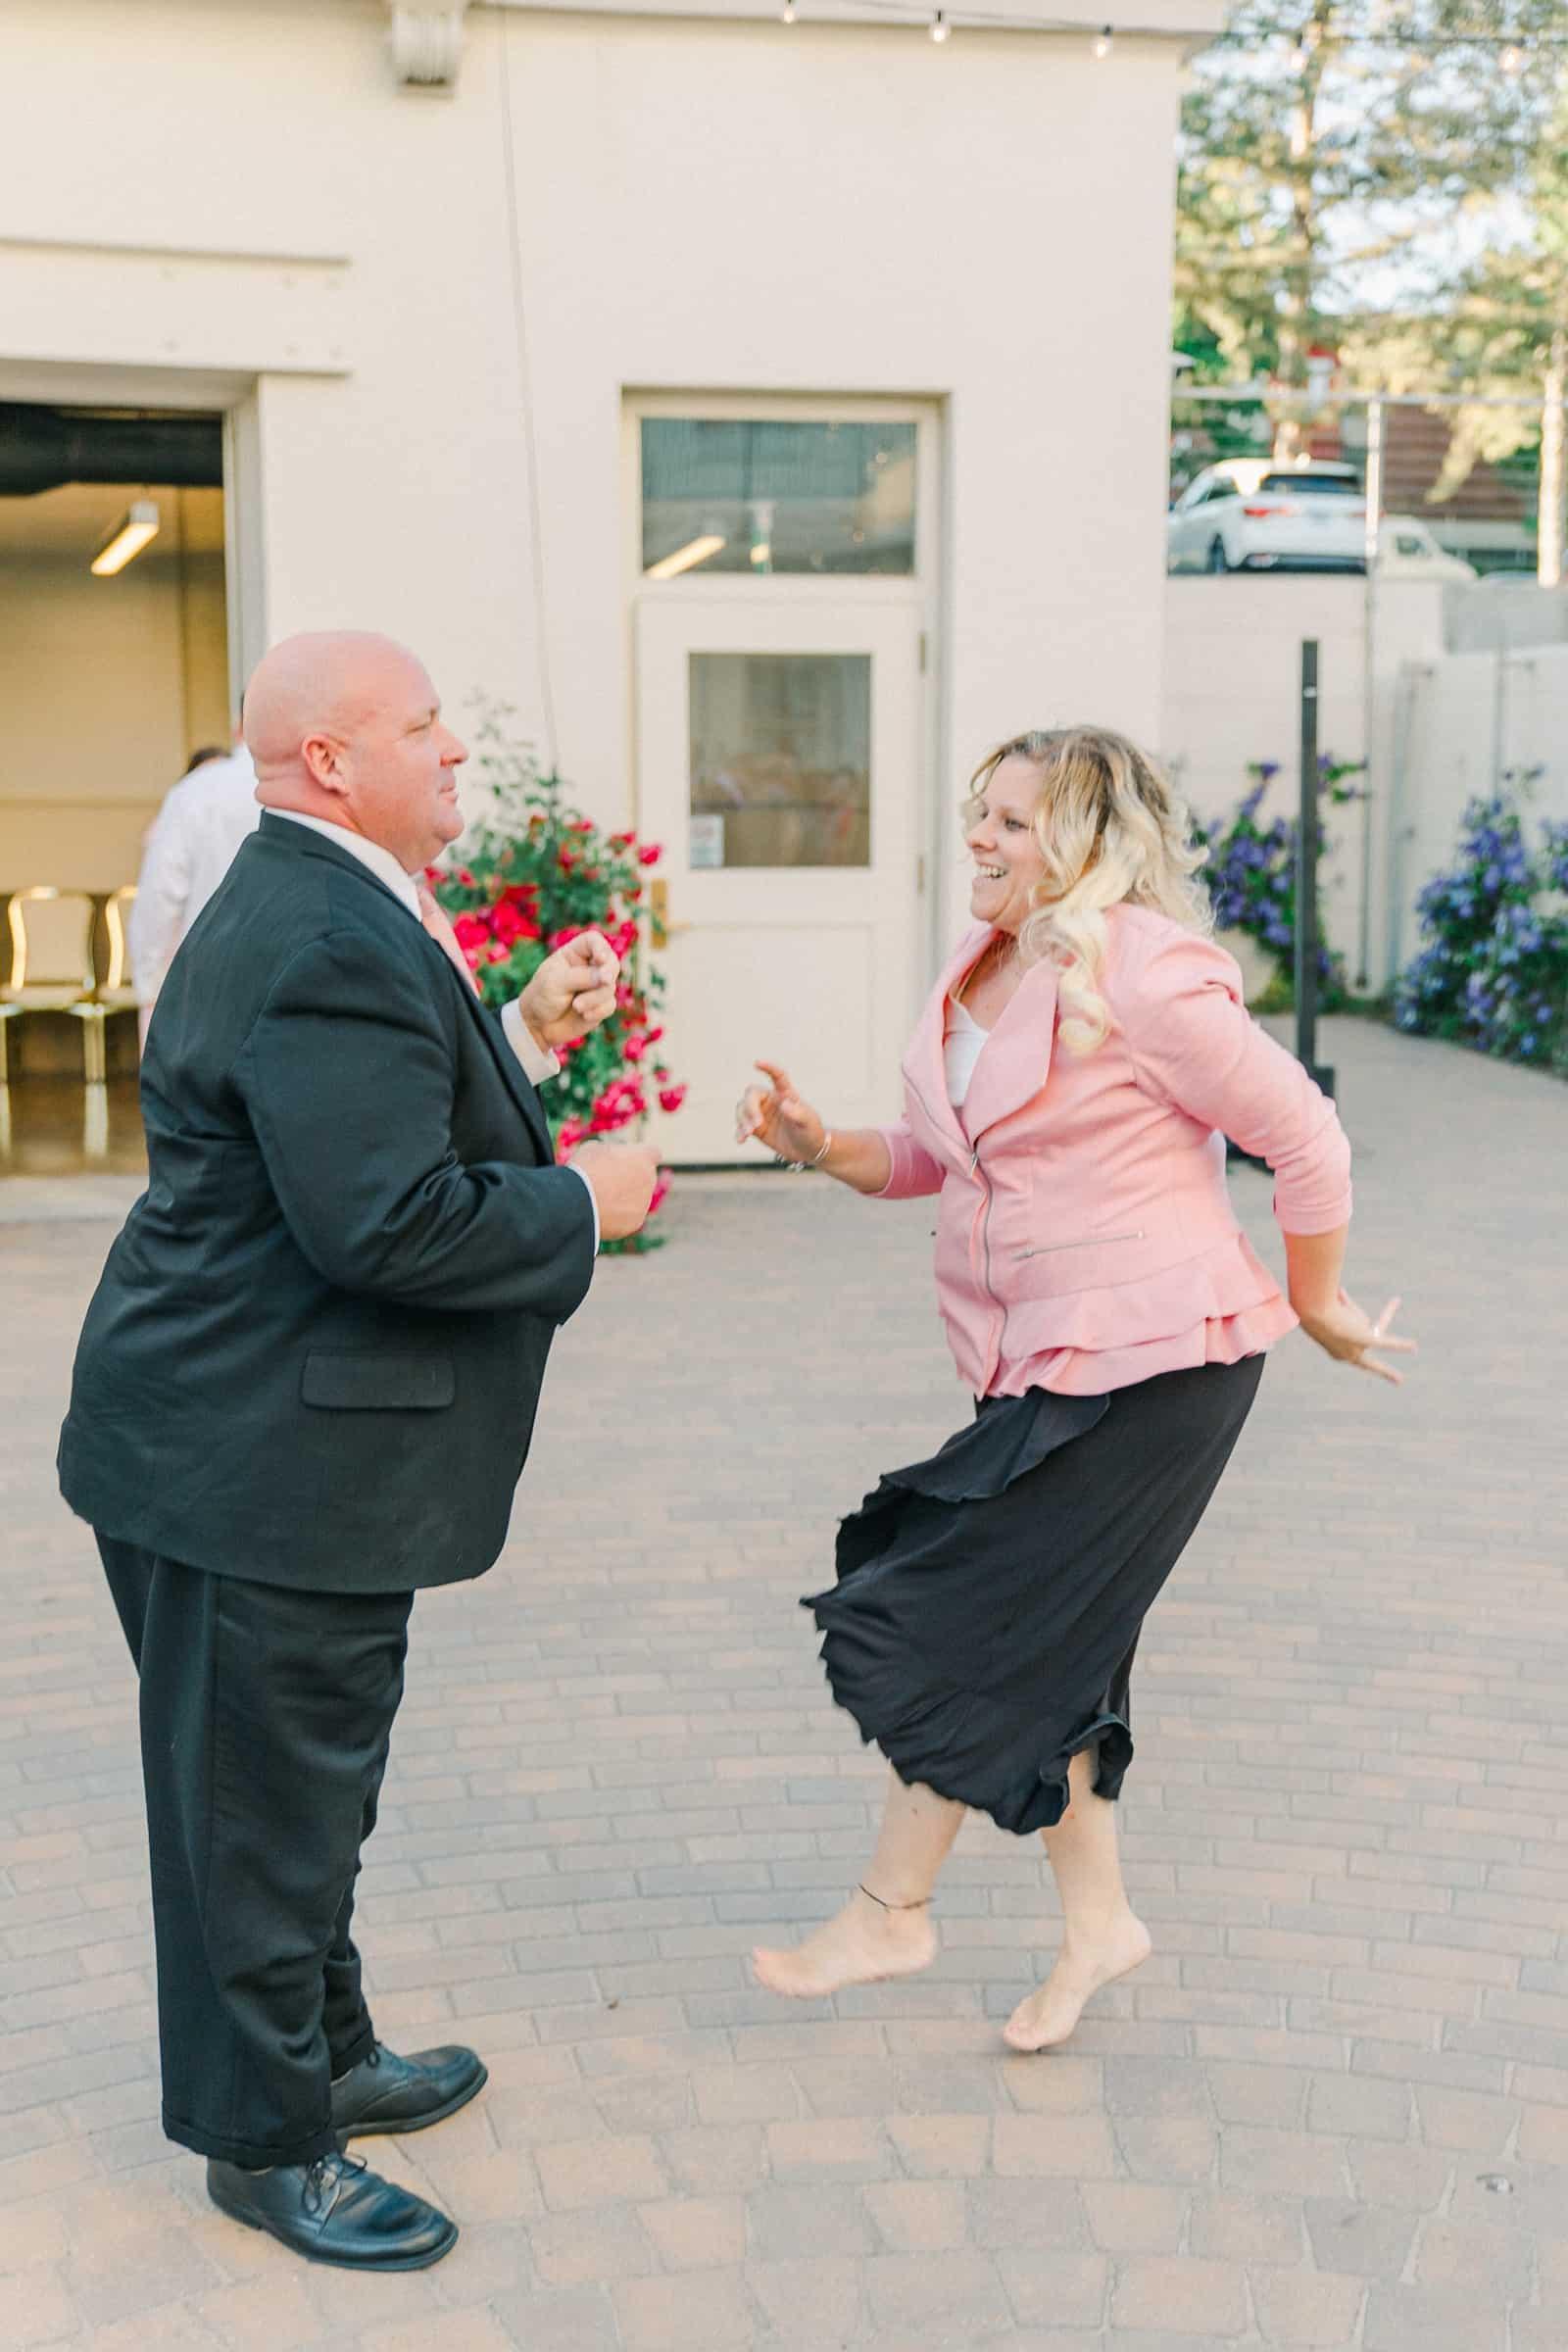 Thomas S. Monson Center Wedding, Salt Lake LDS Temple Wedding, Utah wedding photography